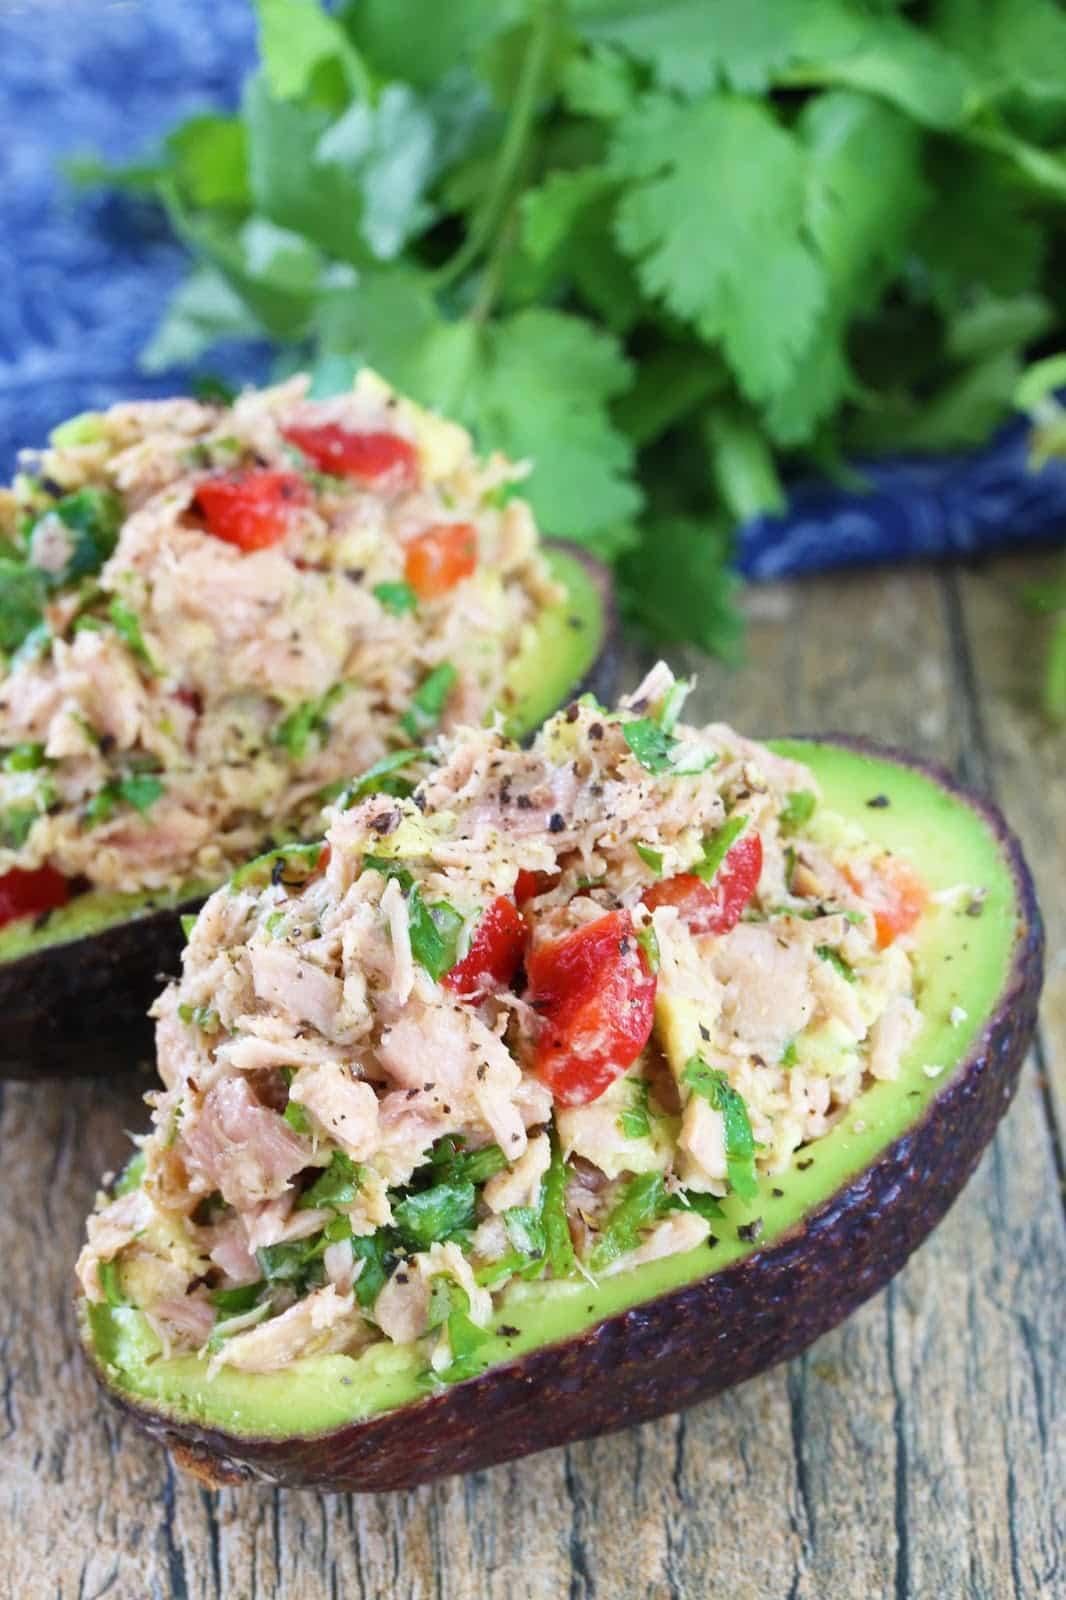 Healthy Guacamole Meals  Healthy Thai Tuna Stuffed Avocado